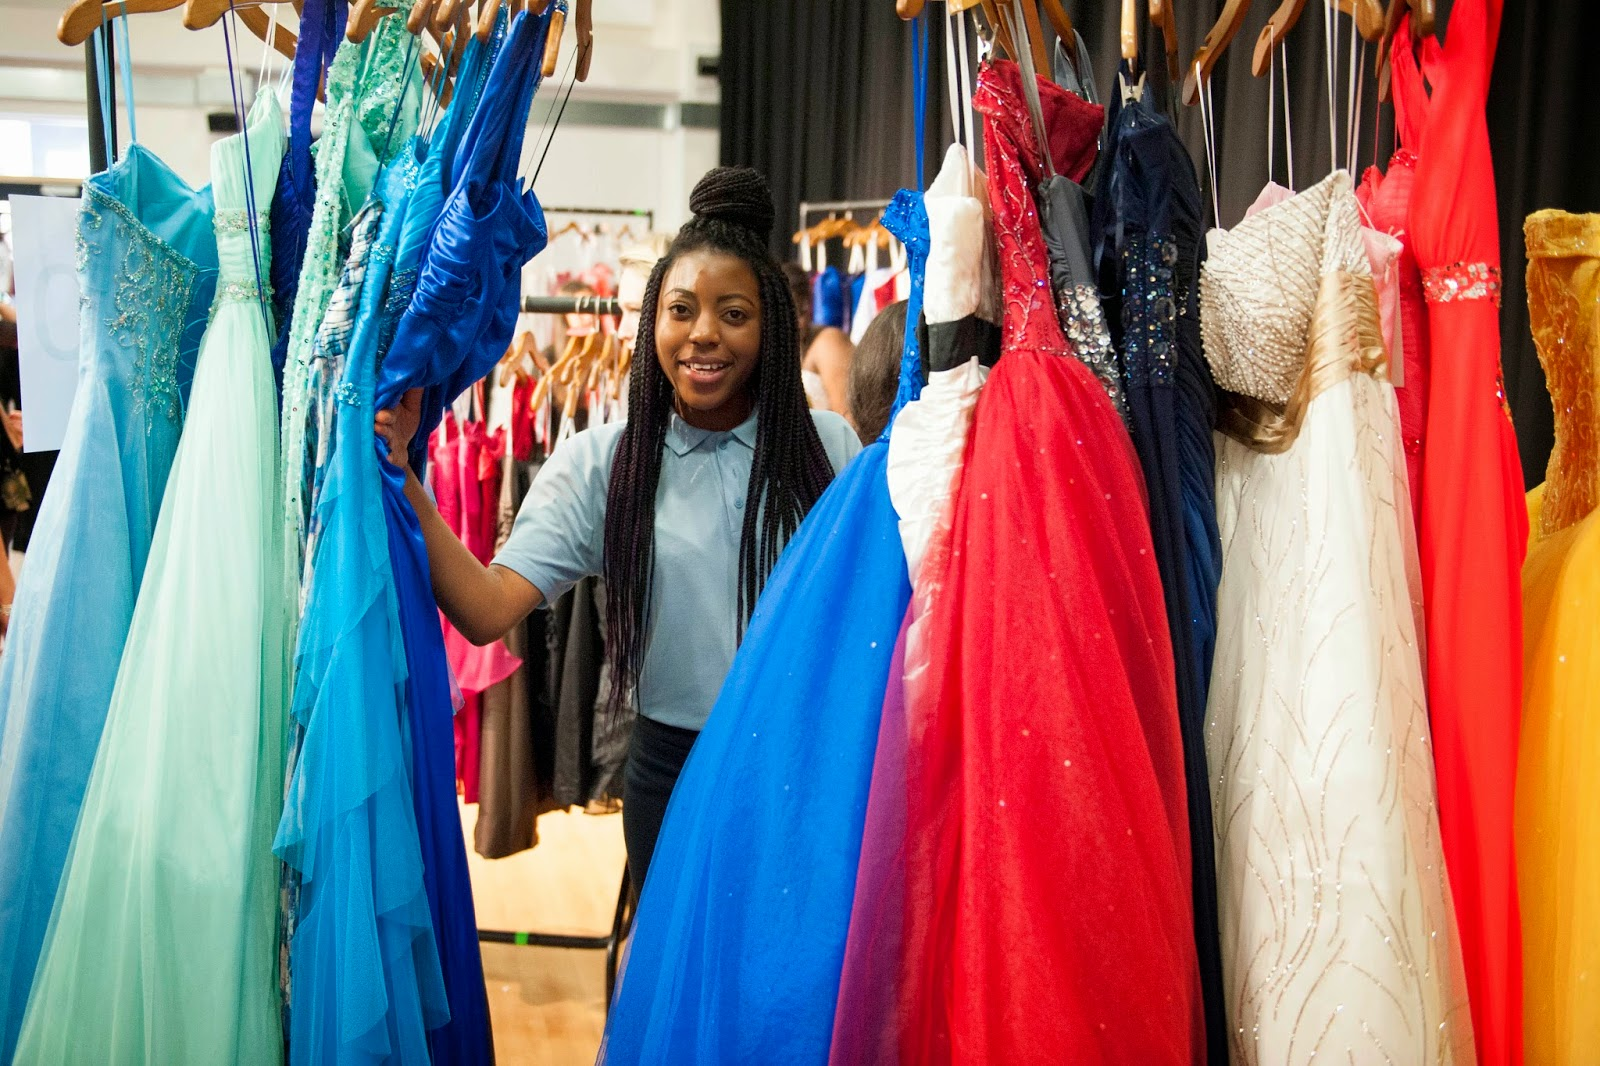 Frumpy To Funky: David's Bridal Donates 150 Prom Dresses